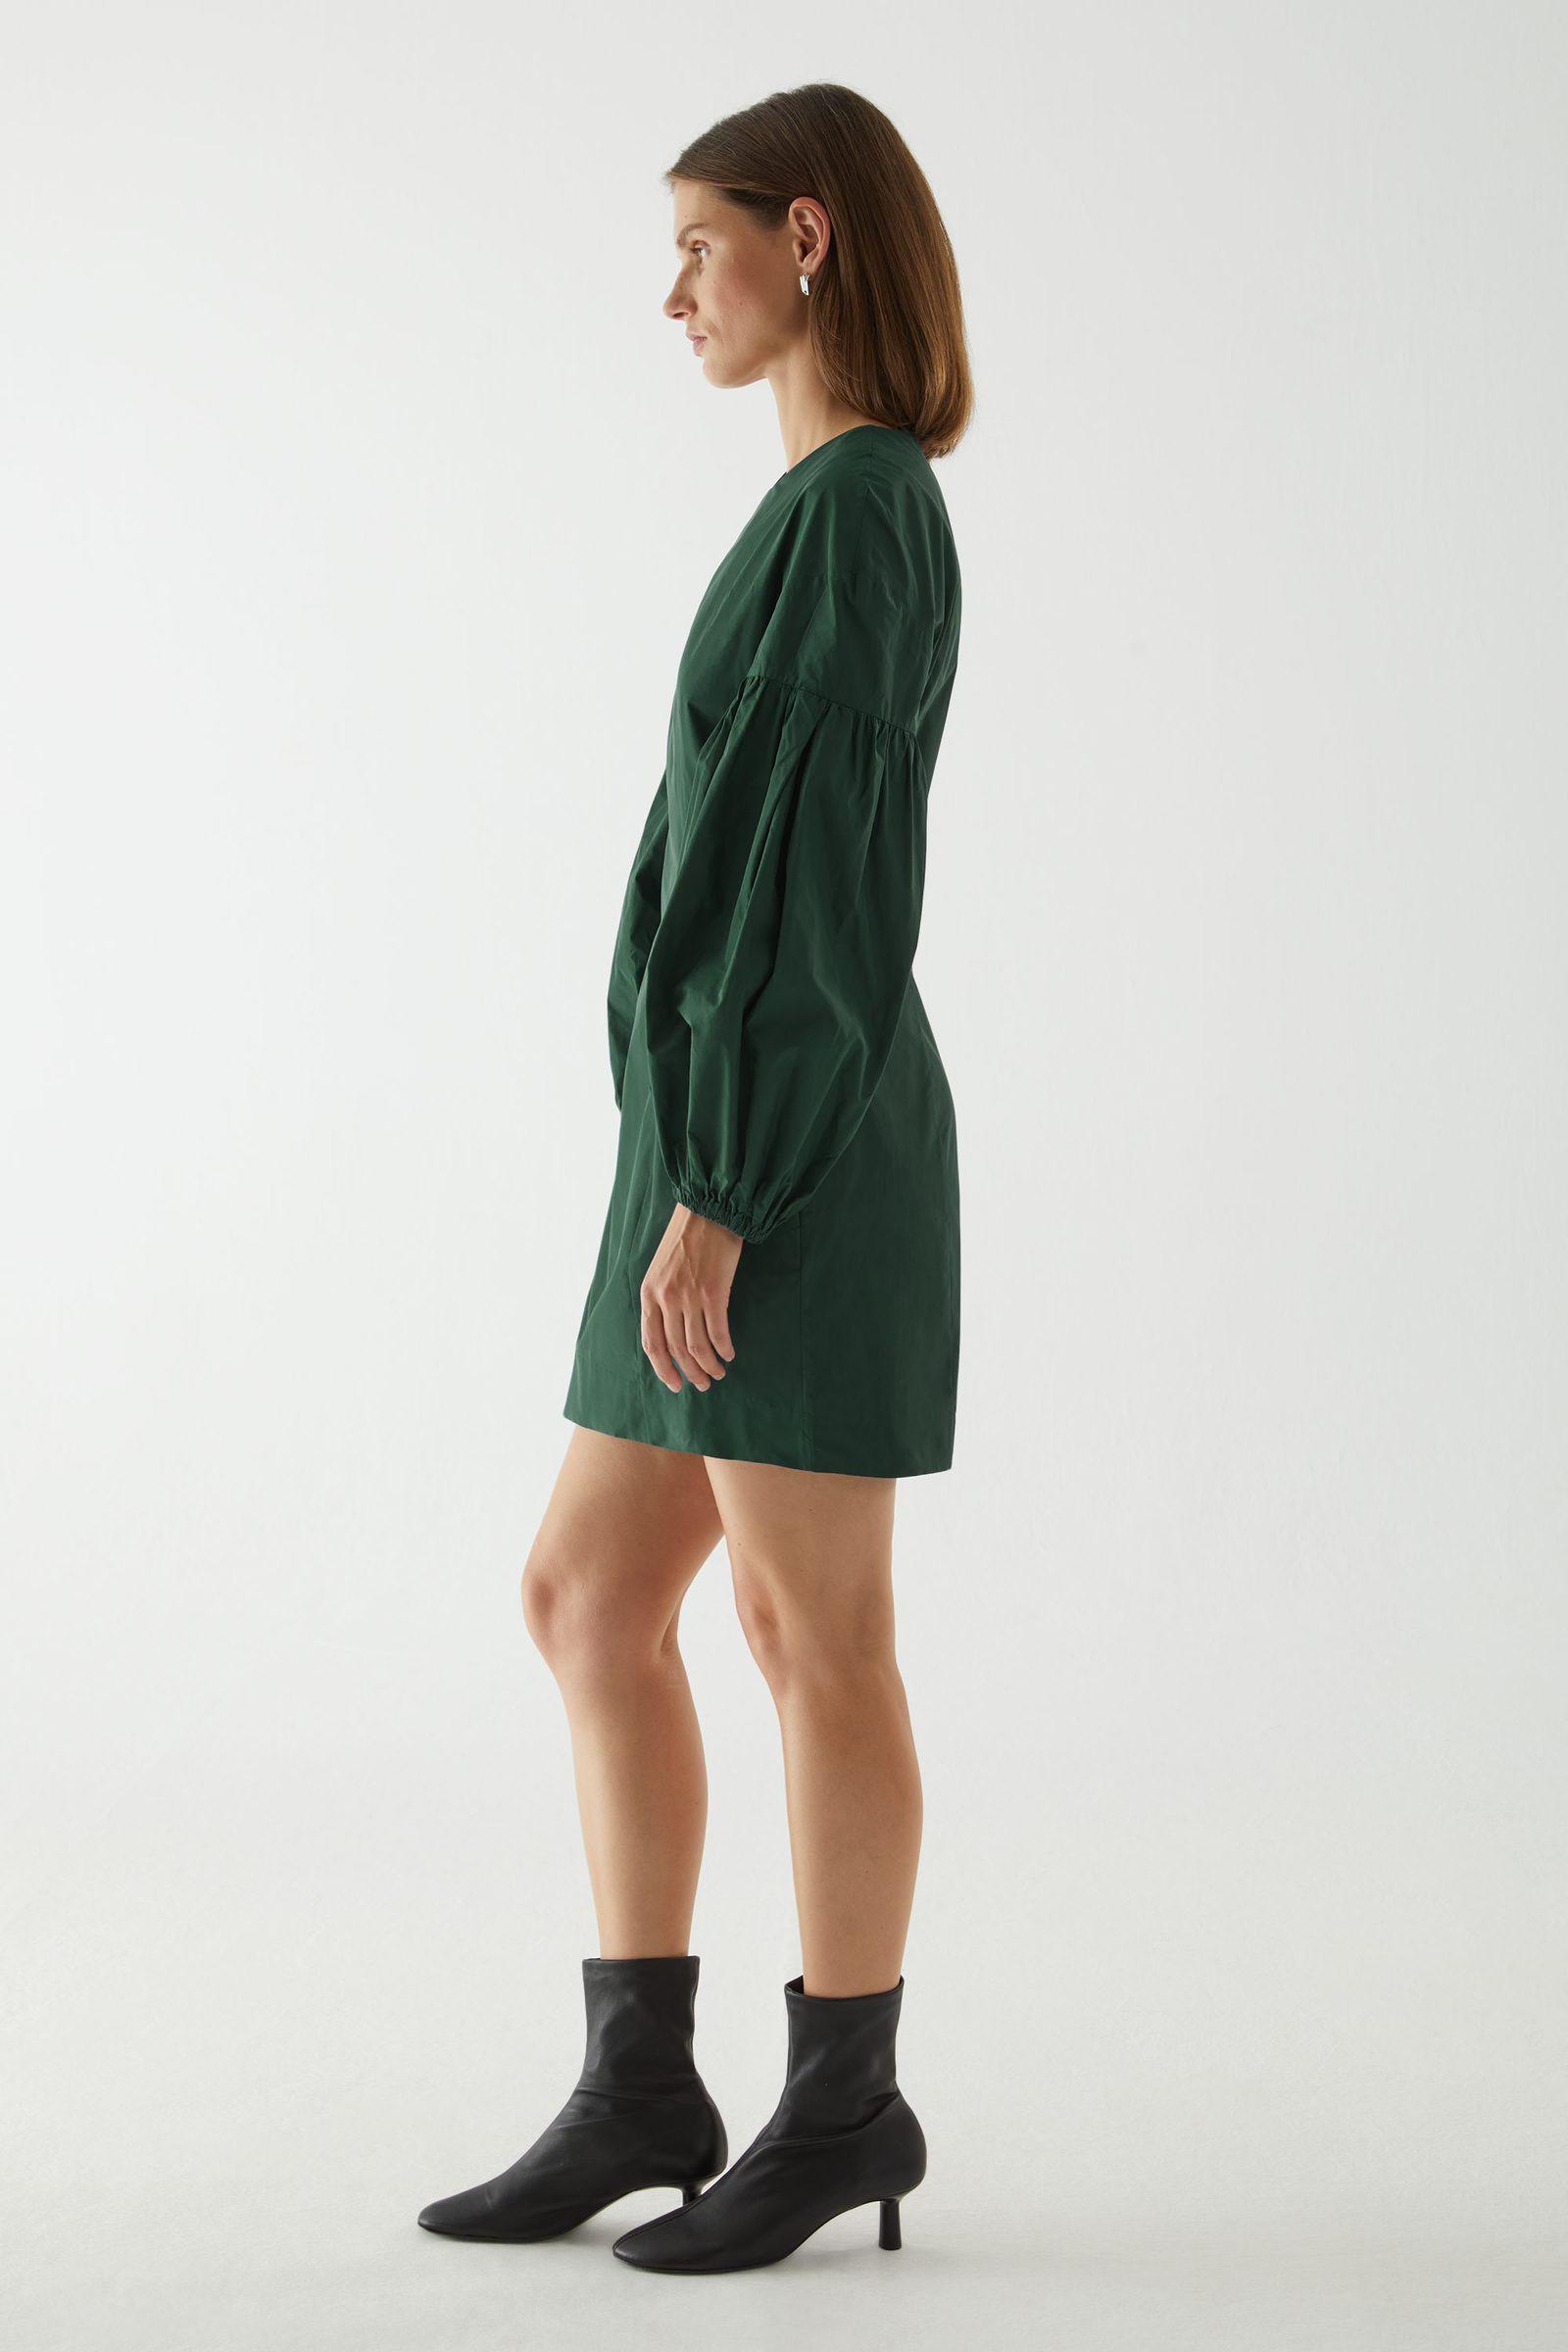 COS 볼륨 슬리브 웨이스트 드레스의 에메랄드 그린컬러 ECOMLook입니다.